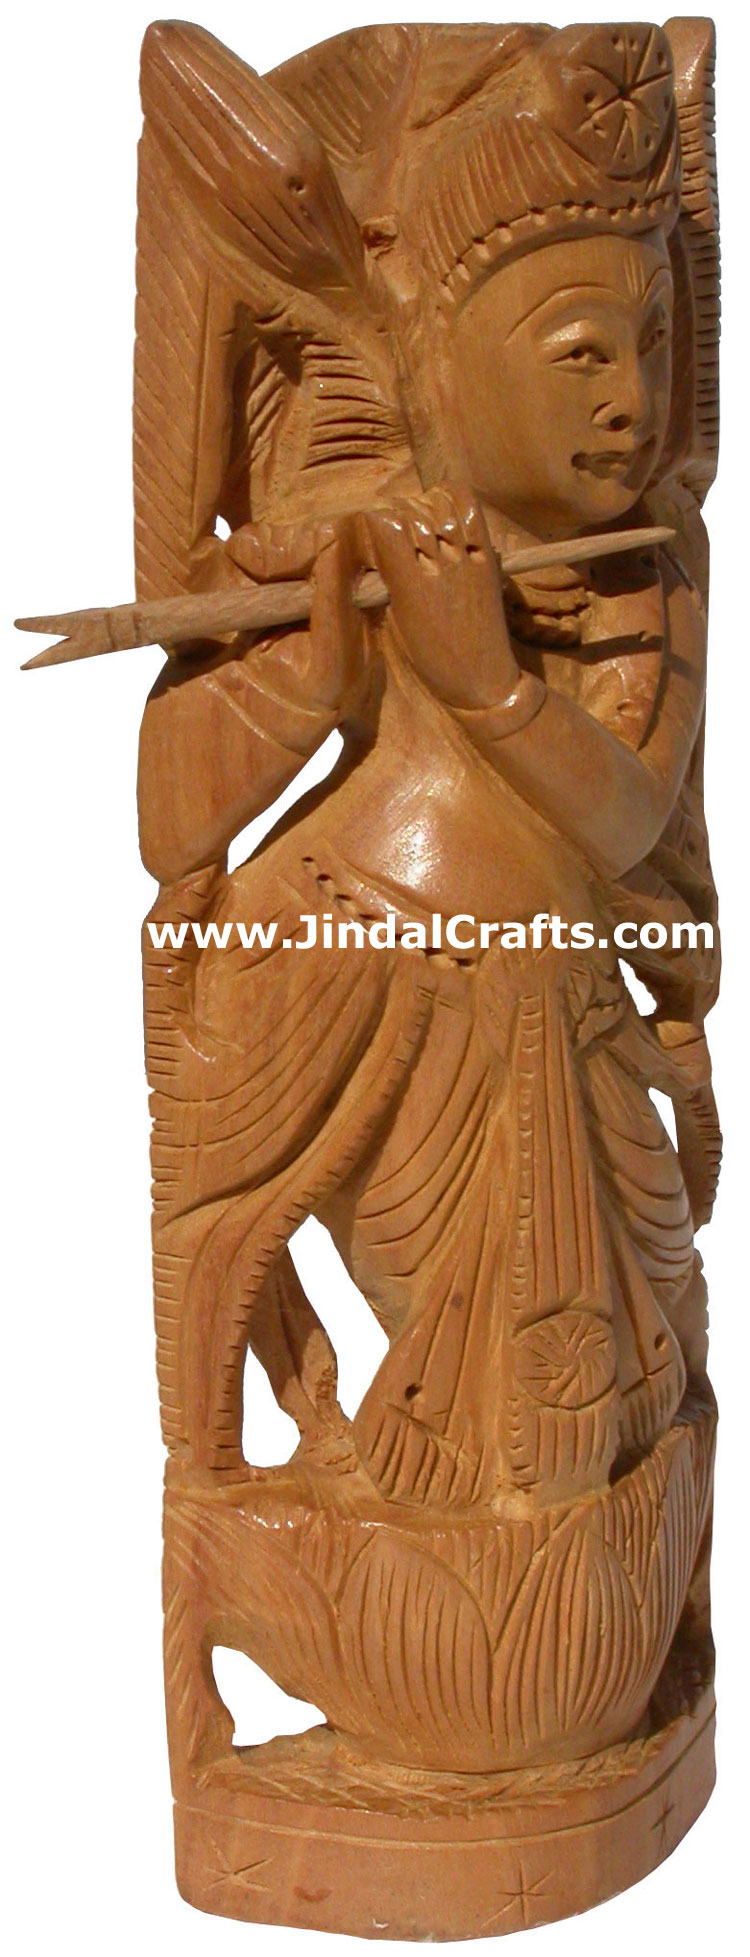 Hindu deities lord krishna india wood carving artefact